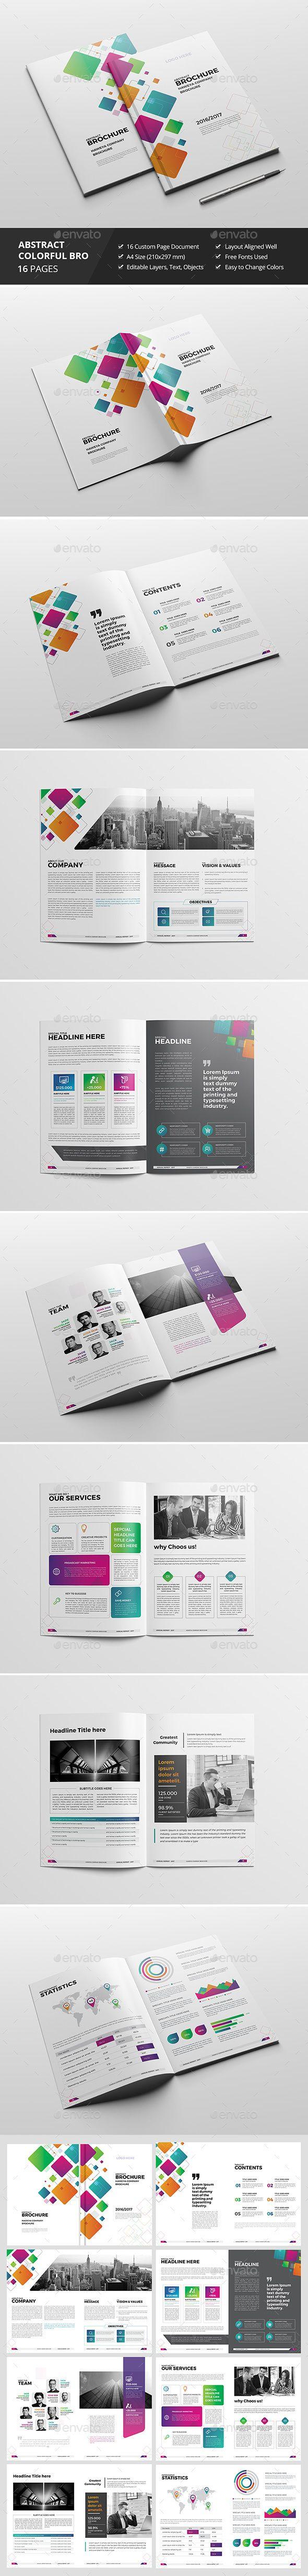 Haweya Colorful Brochure Template InDesign INDD